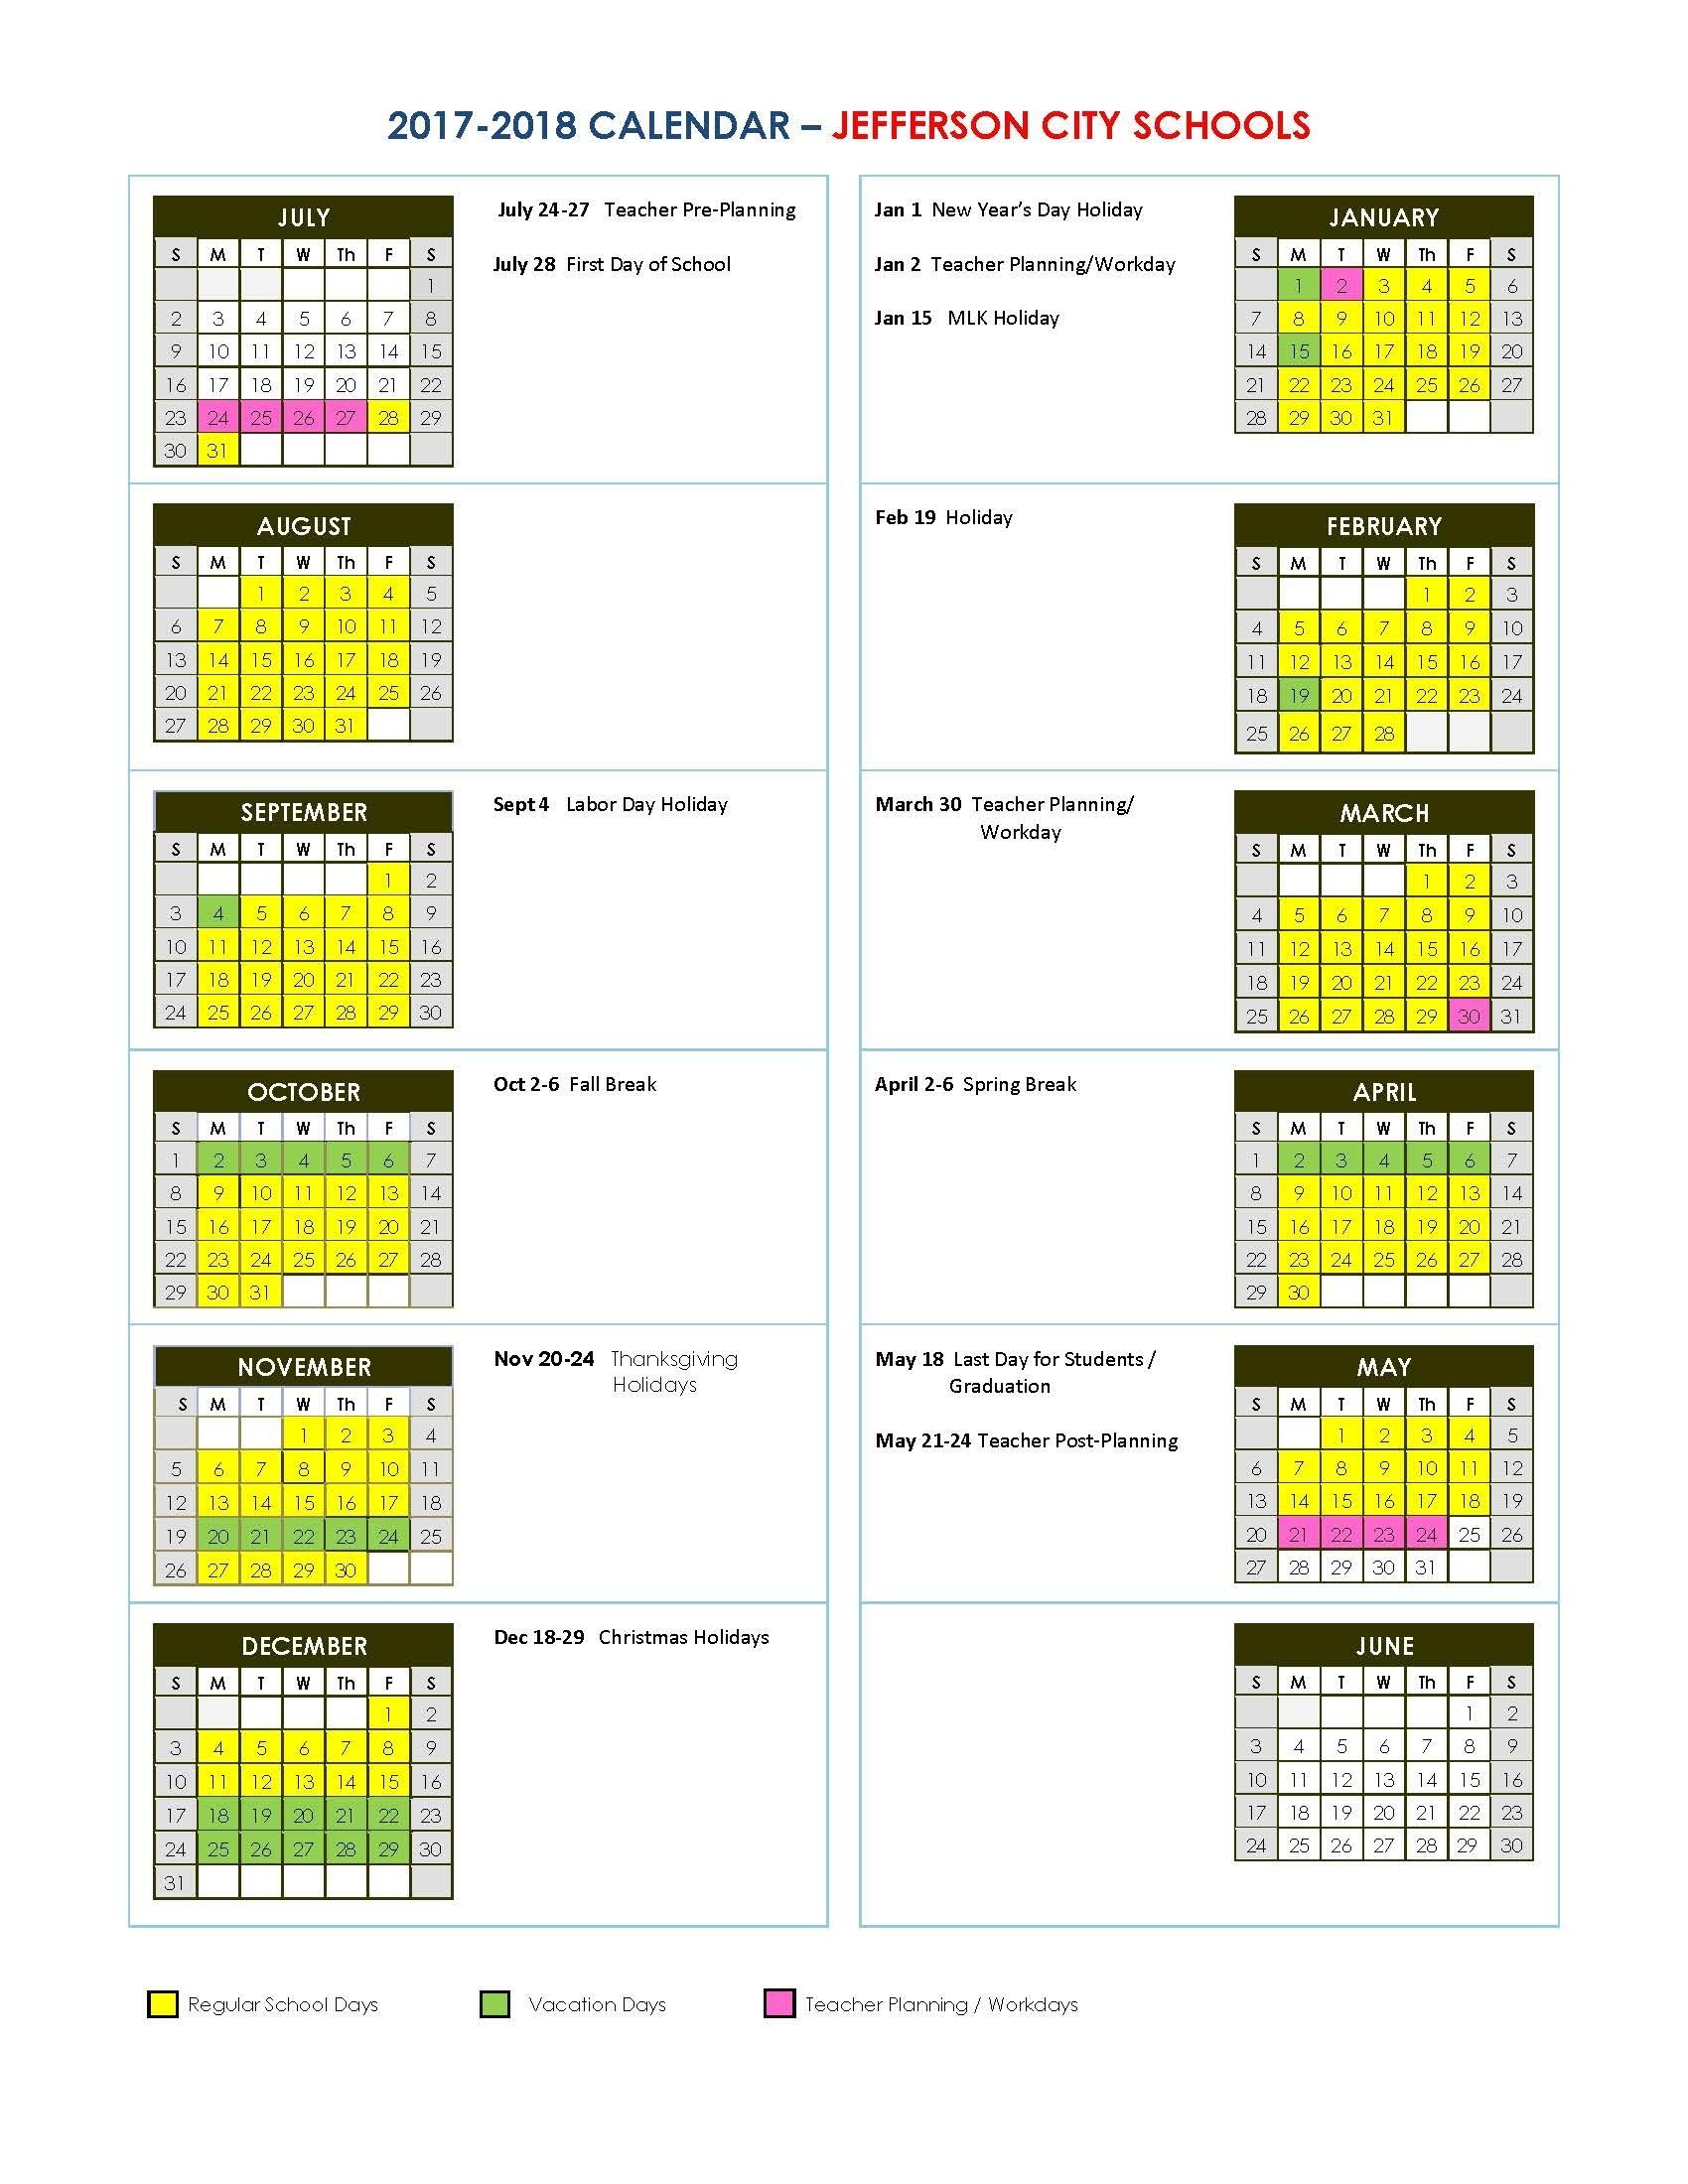 Jefferson City Schools for Uga 2019-2020 Calendar